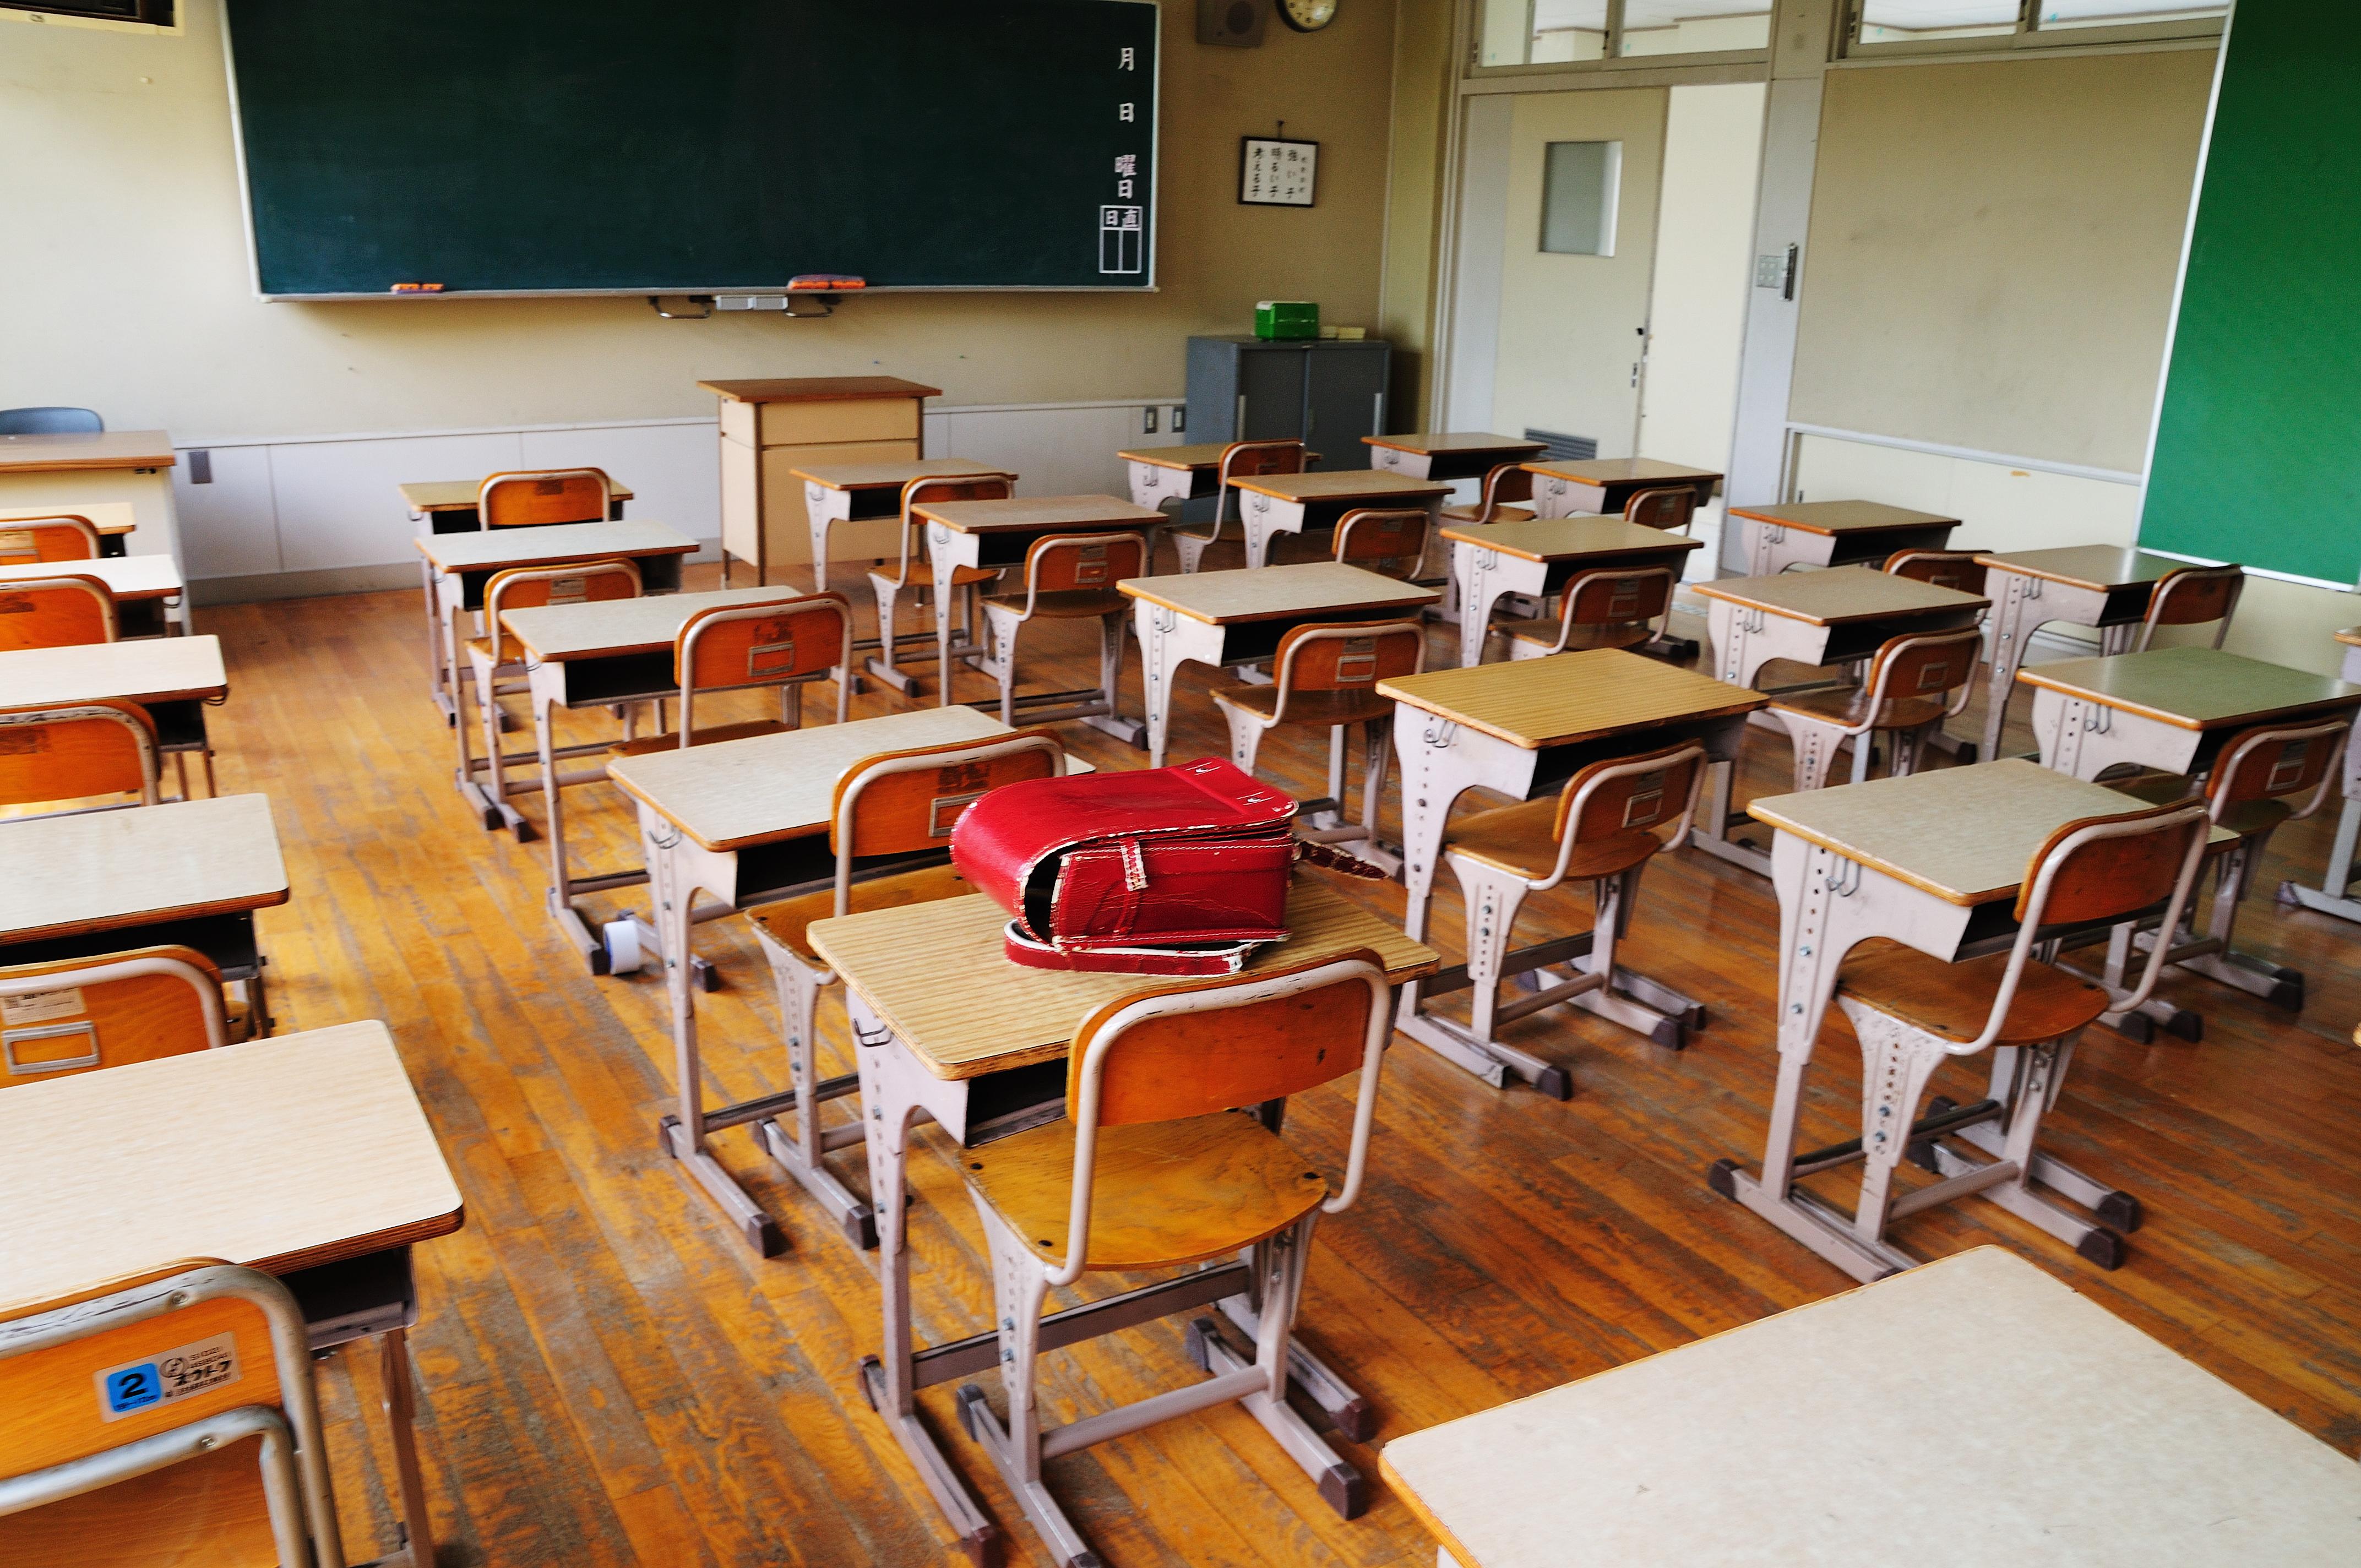 https://upload.wikimedia.org/wikipedia/commons/3/3b/Heiwa_elementary_school_18.jpg